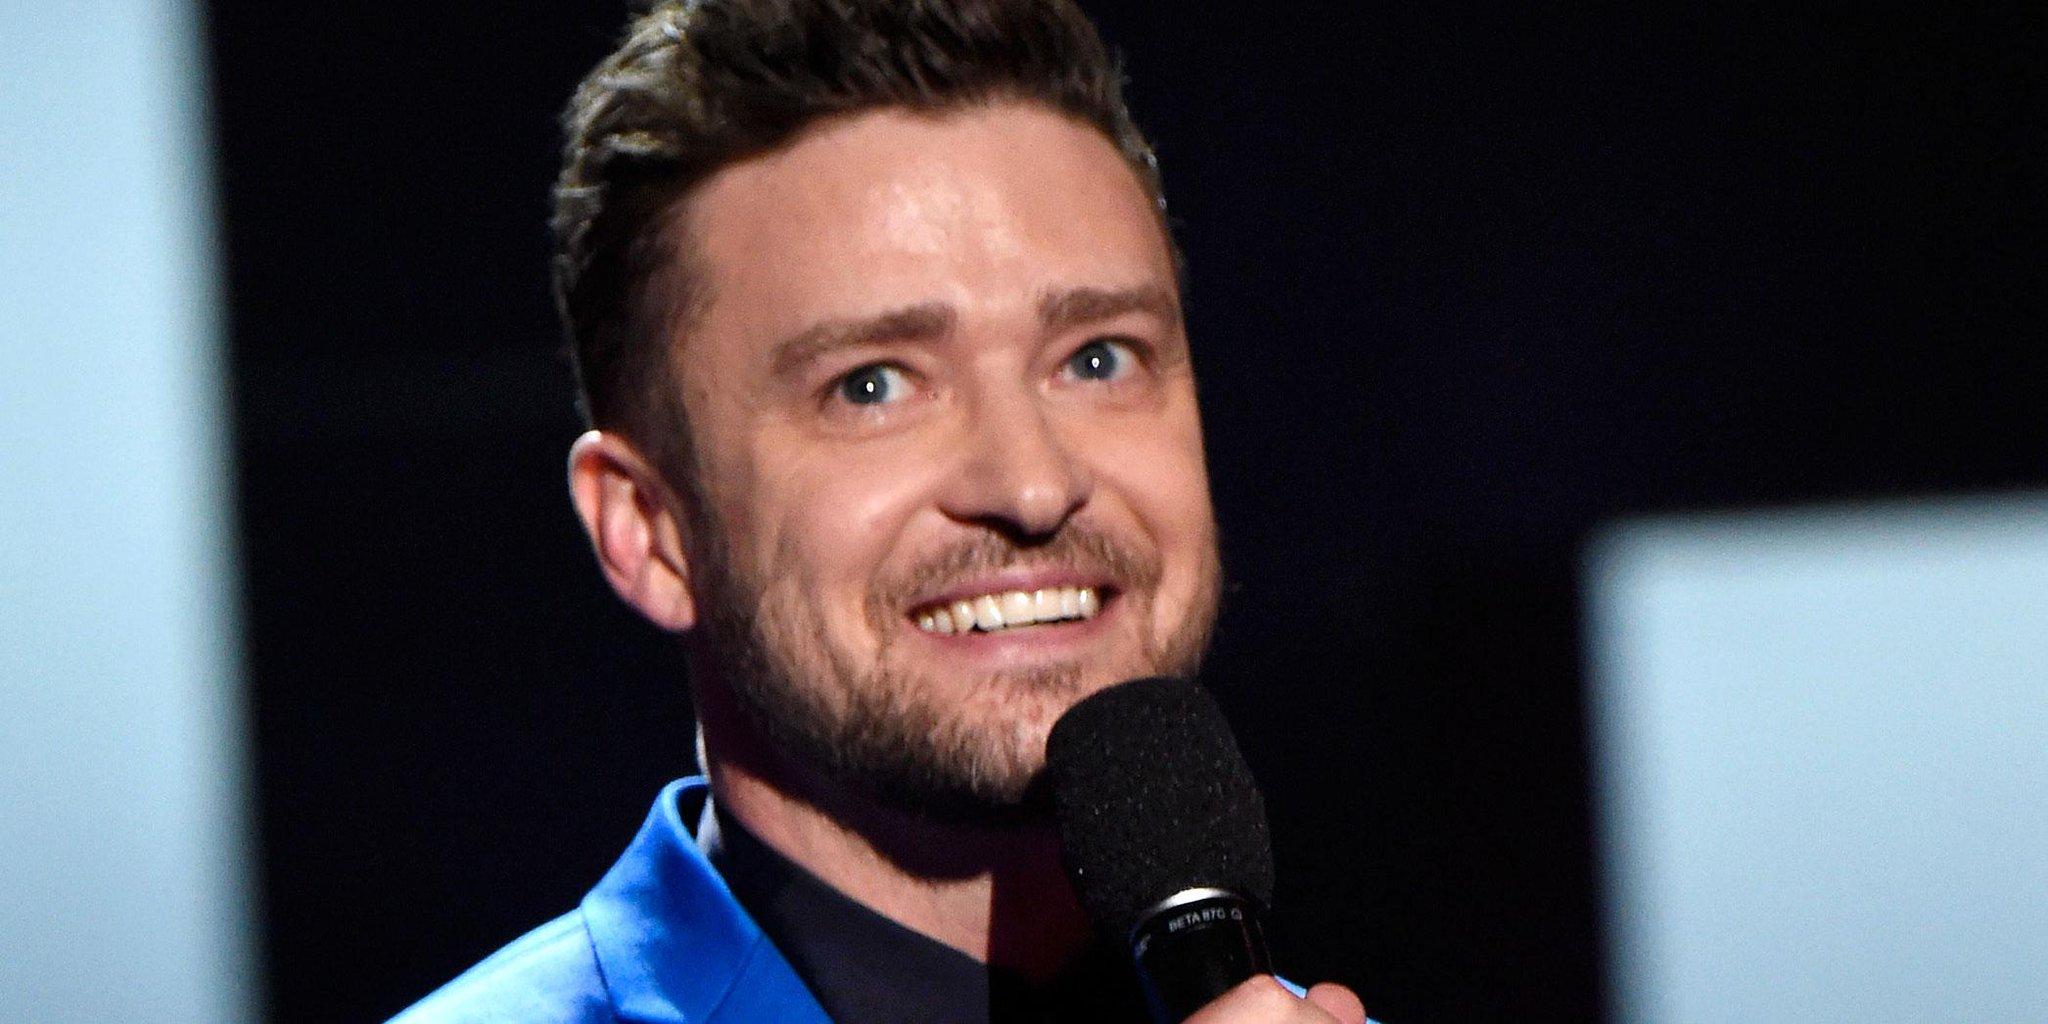 Justin Timberlake gave the CUTEST acceptance speech about Jessica Biel http://t.co/8wAI4g3bVS http://t.co/DpP9IqGHjG